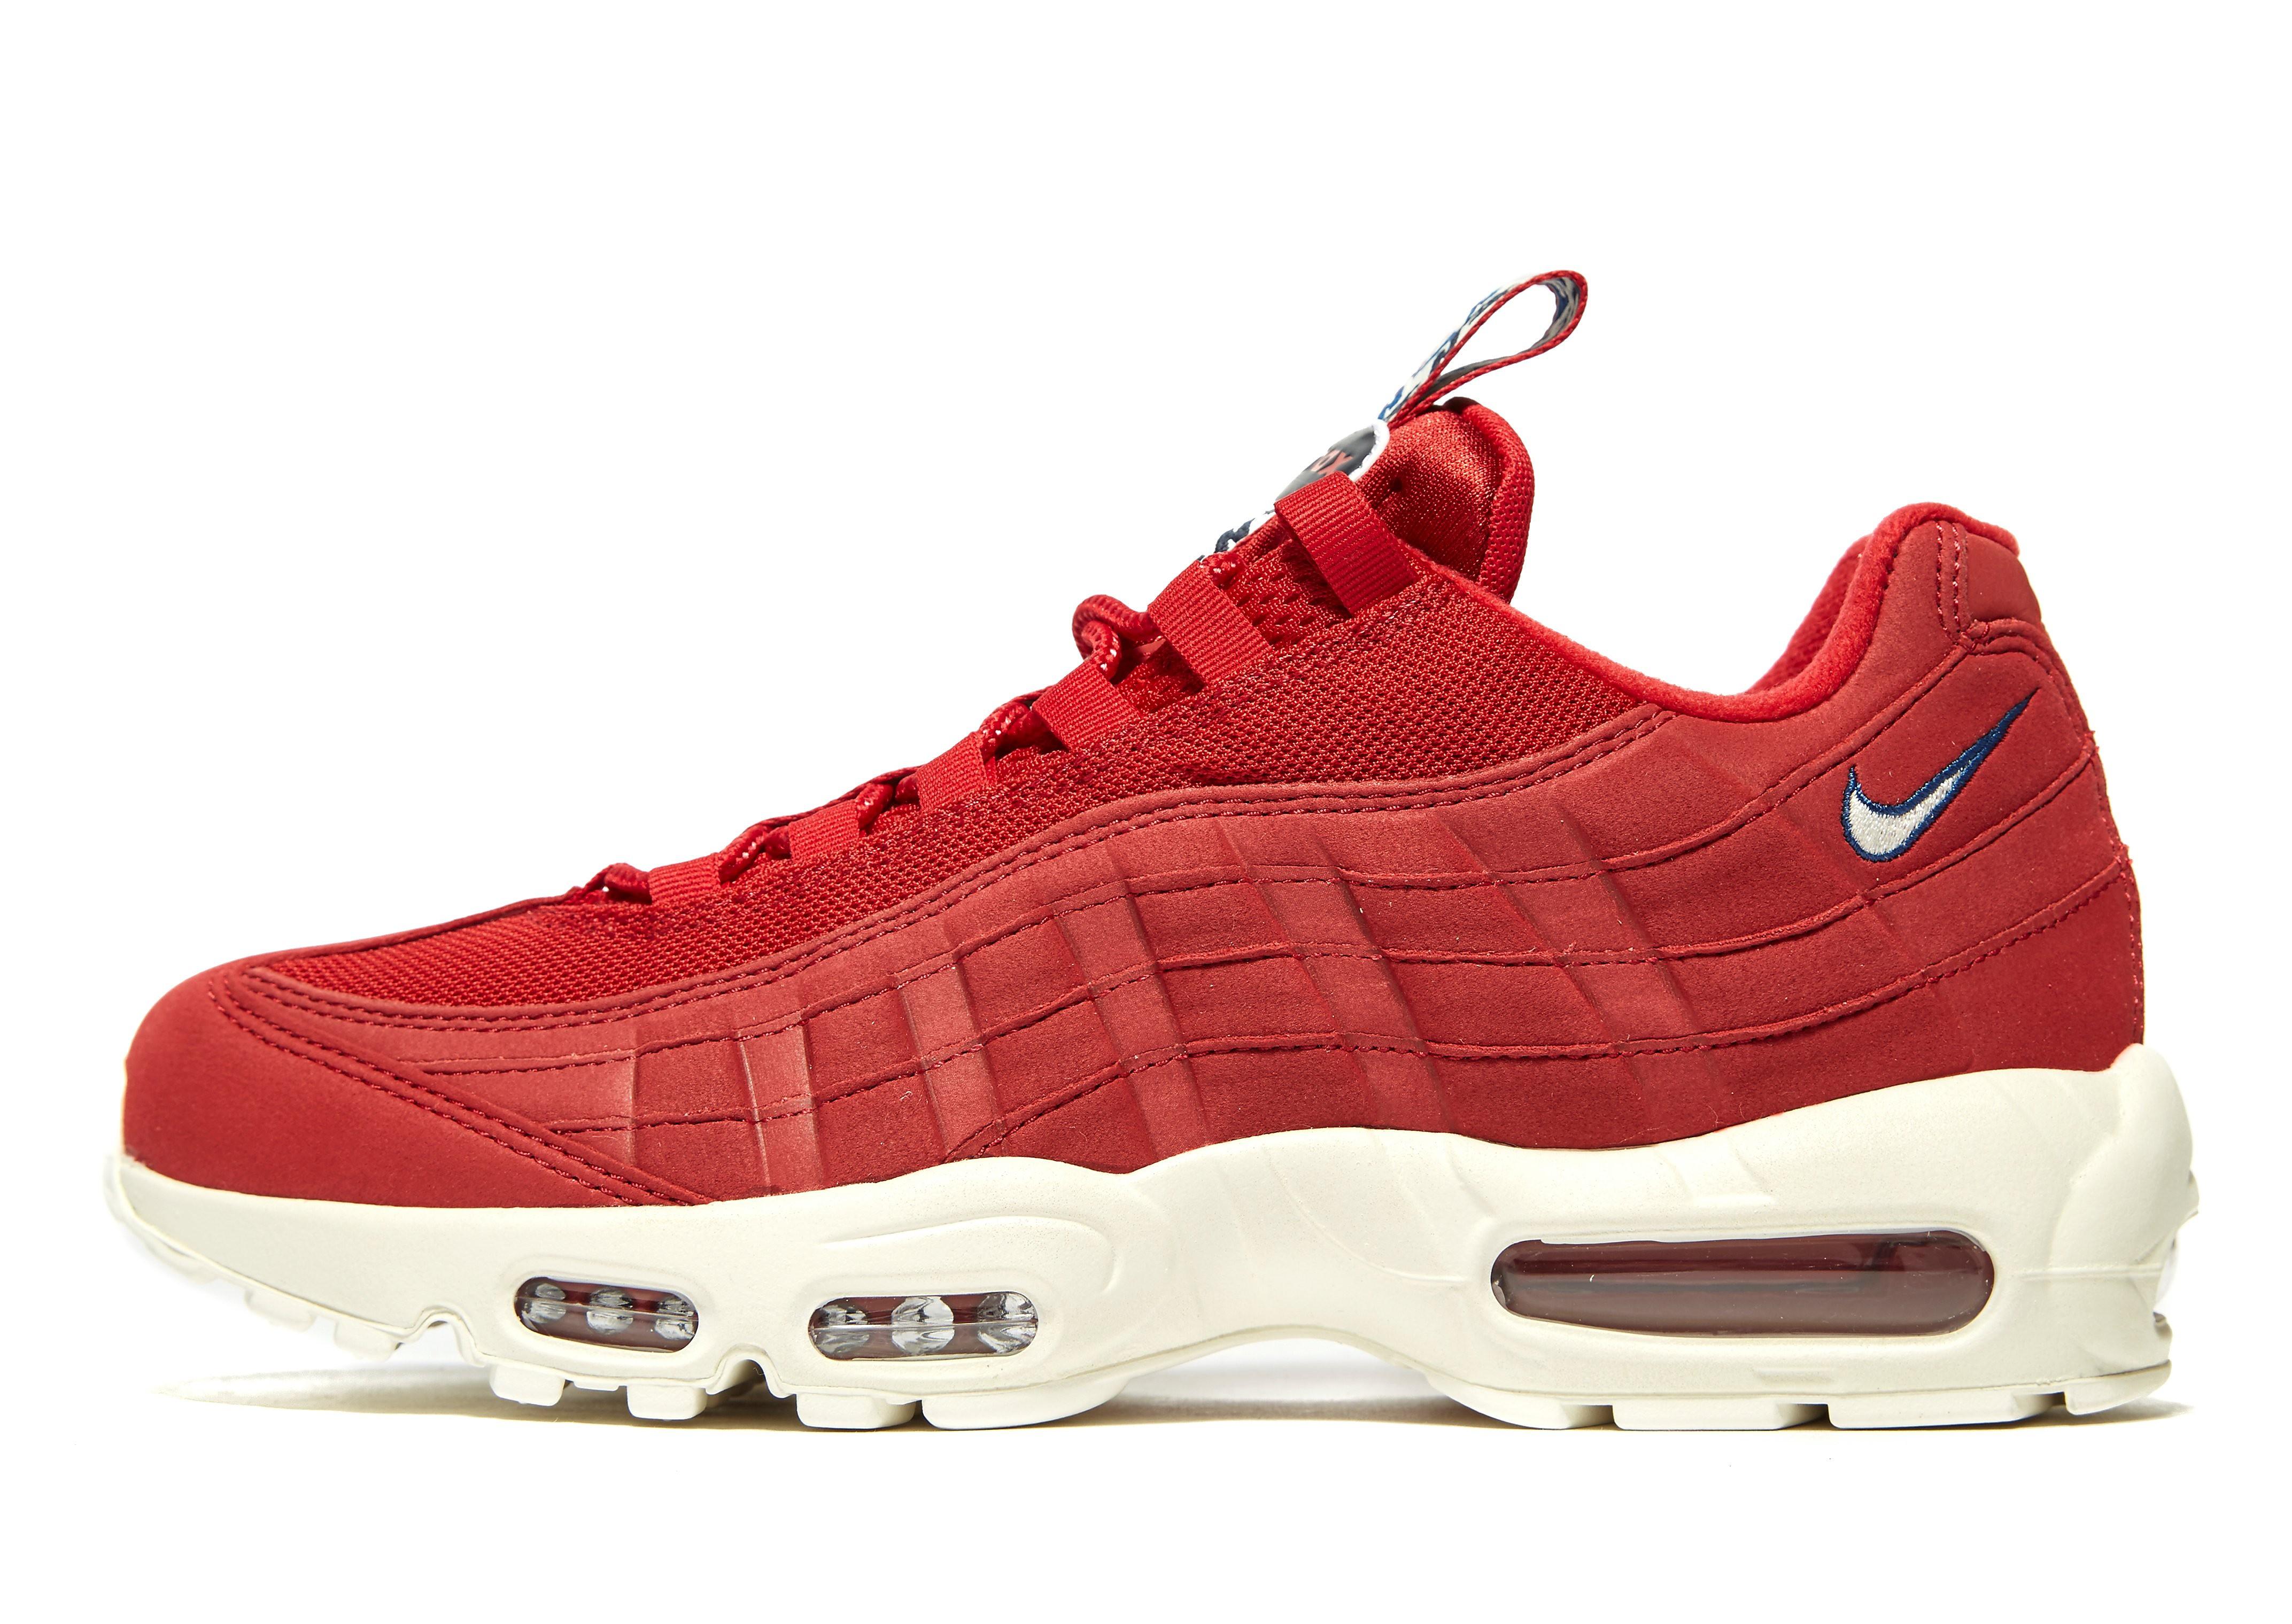 Nike Air Max 95 'Taped' Rot-Weiß